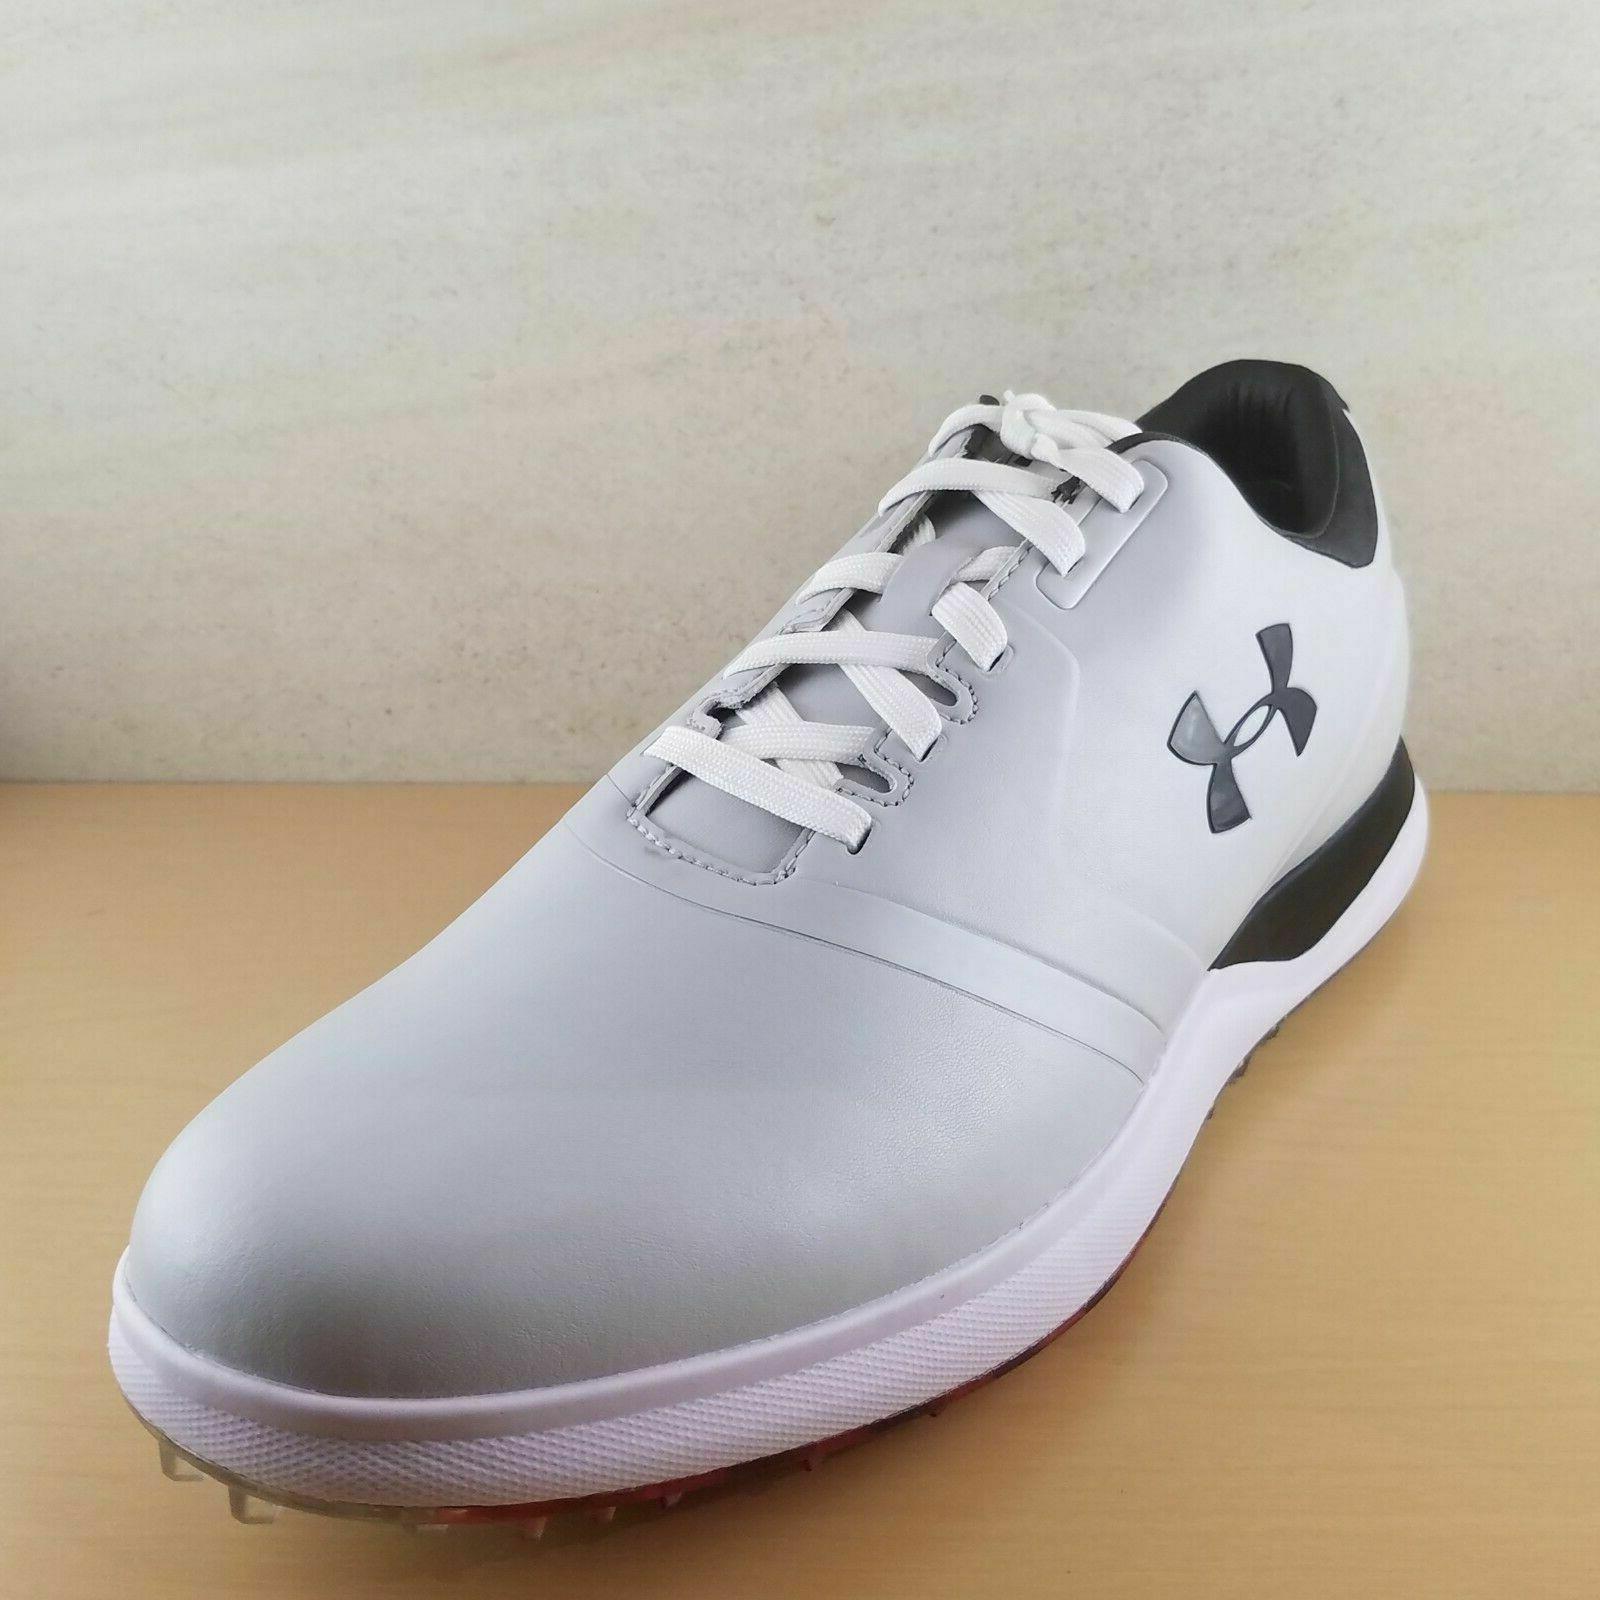 Under UA Performance SL Grey/White/Black 1297177-101 Size